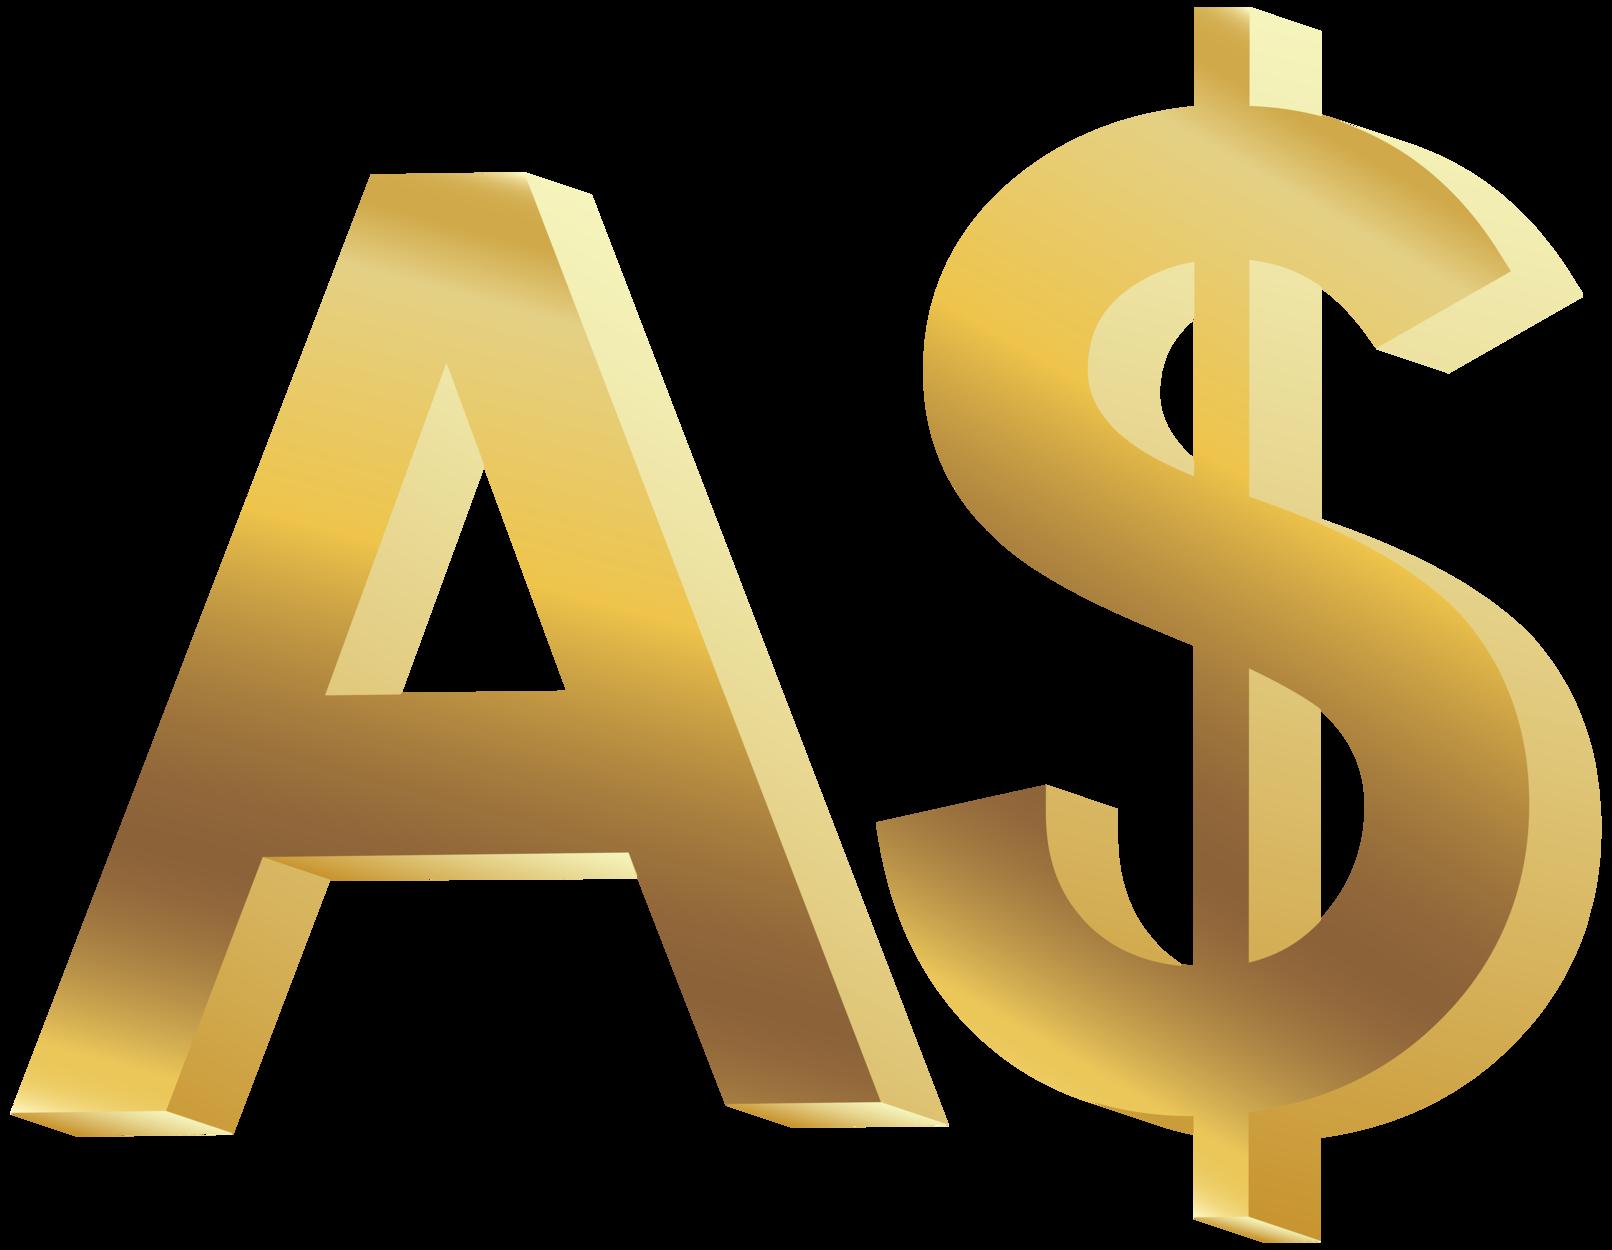 dollars clipart logo